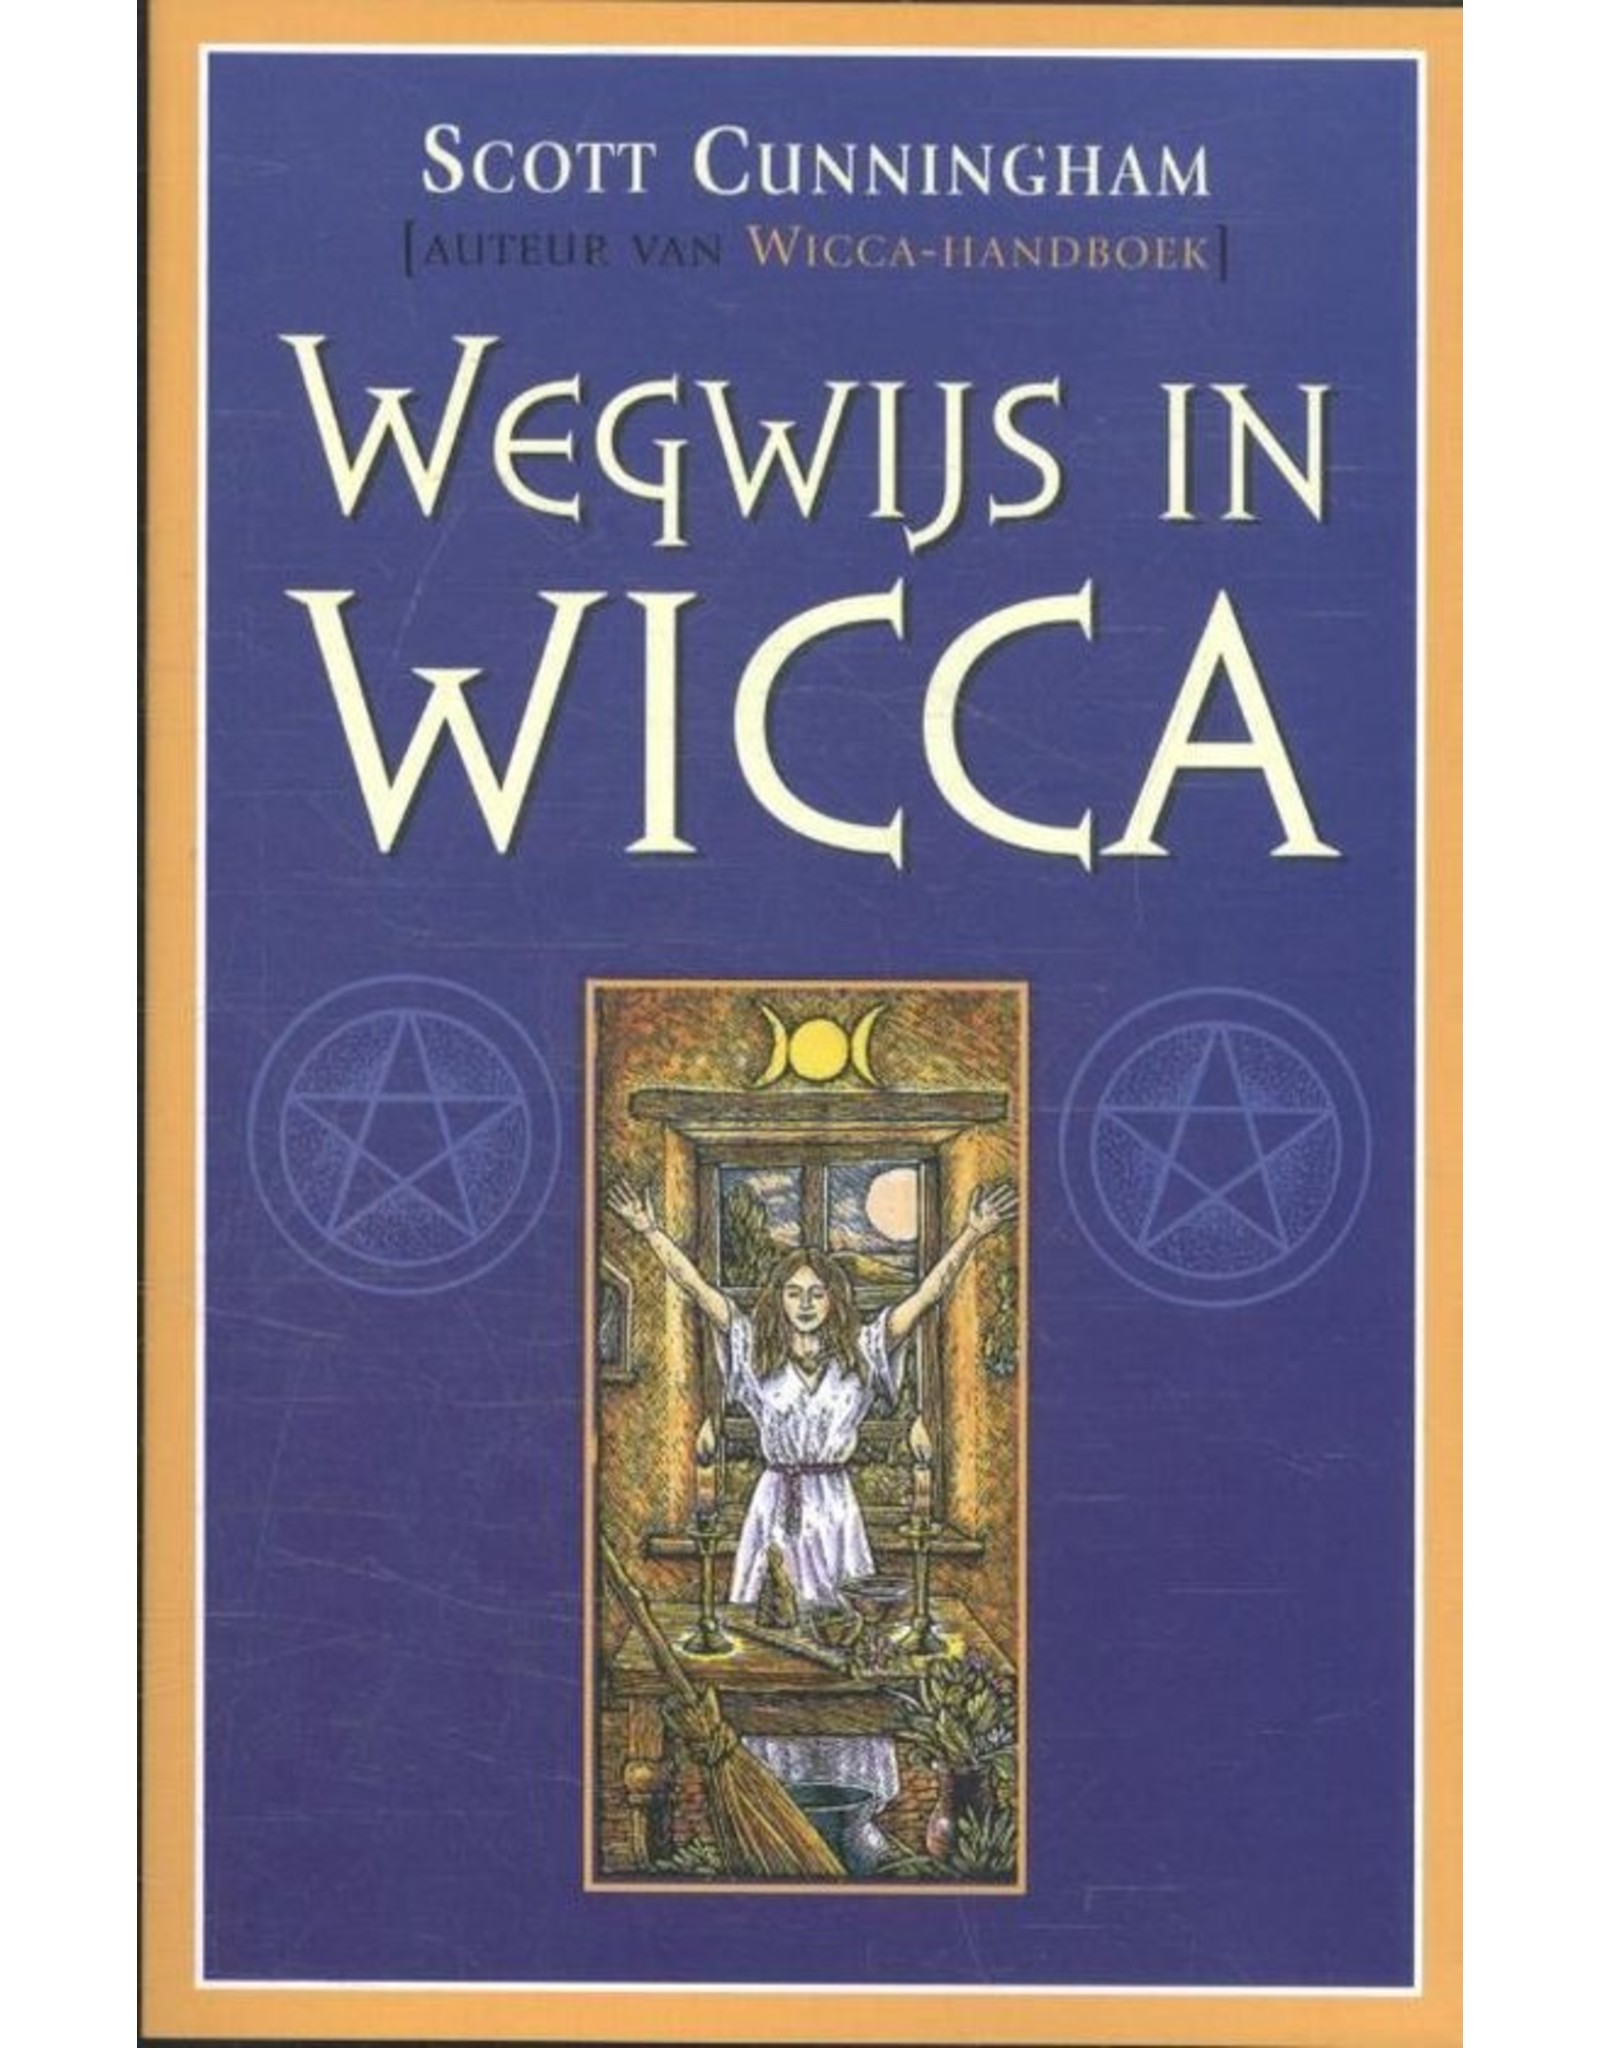 Wegwijs in wicca boek